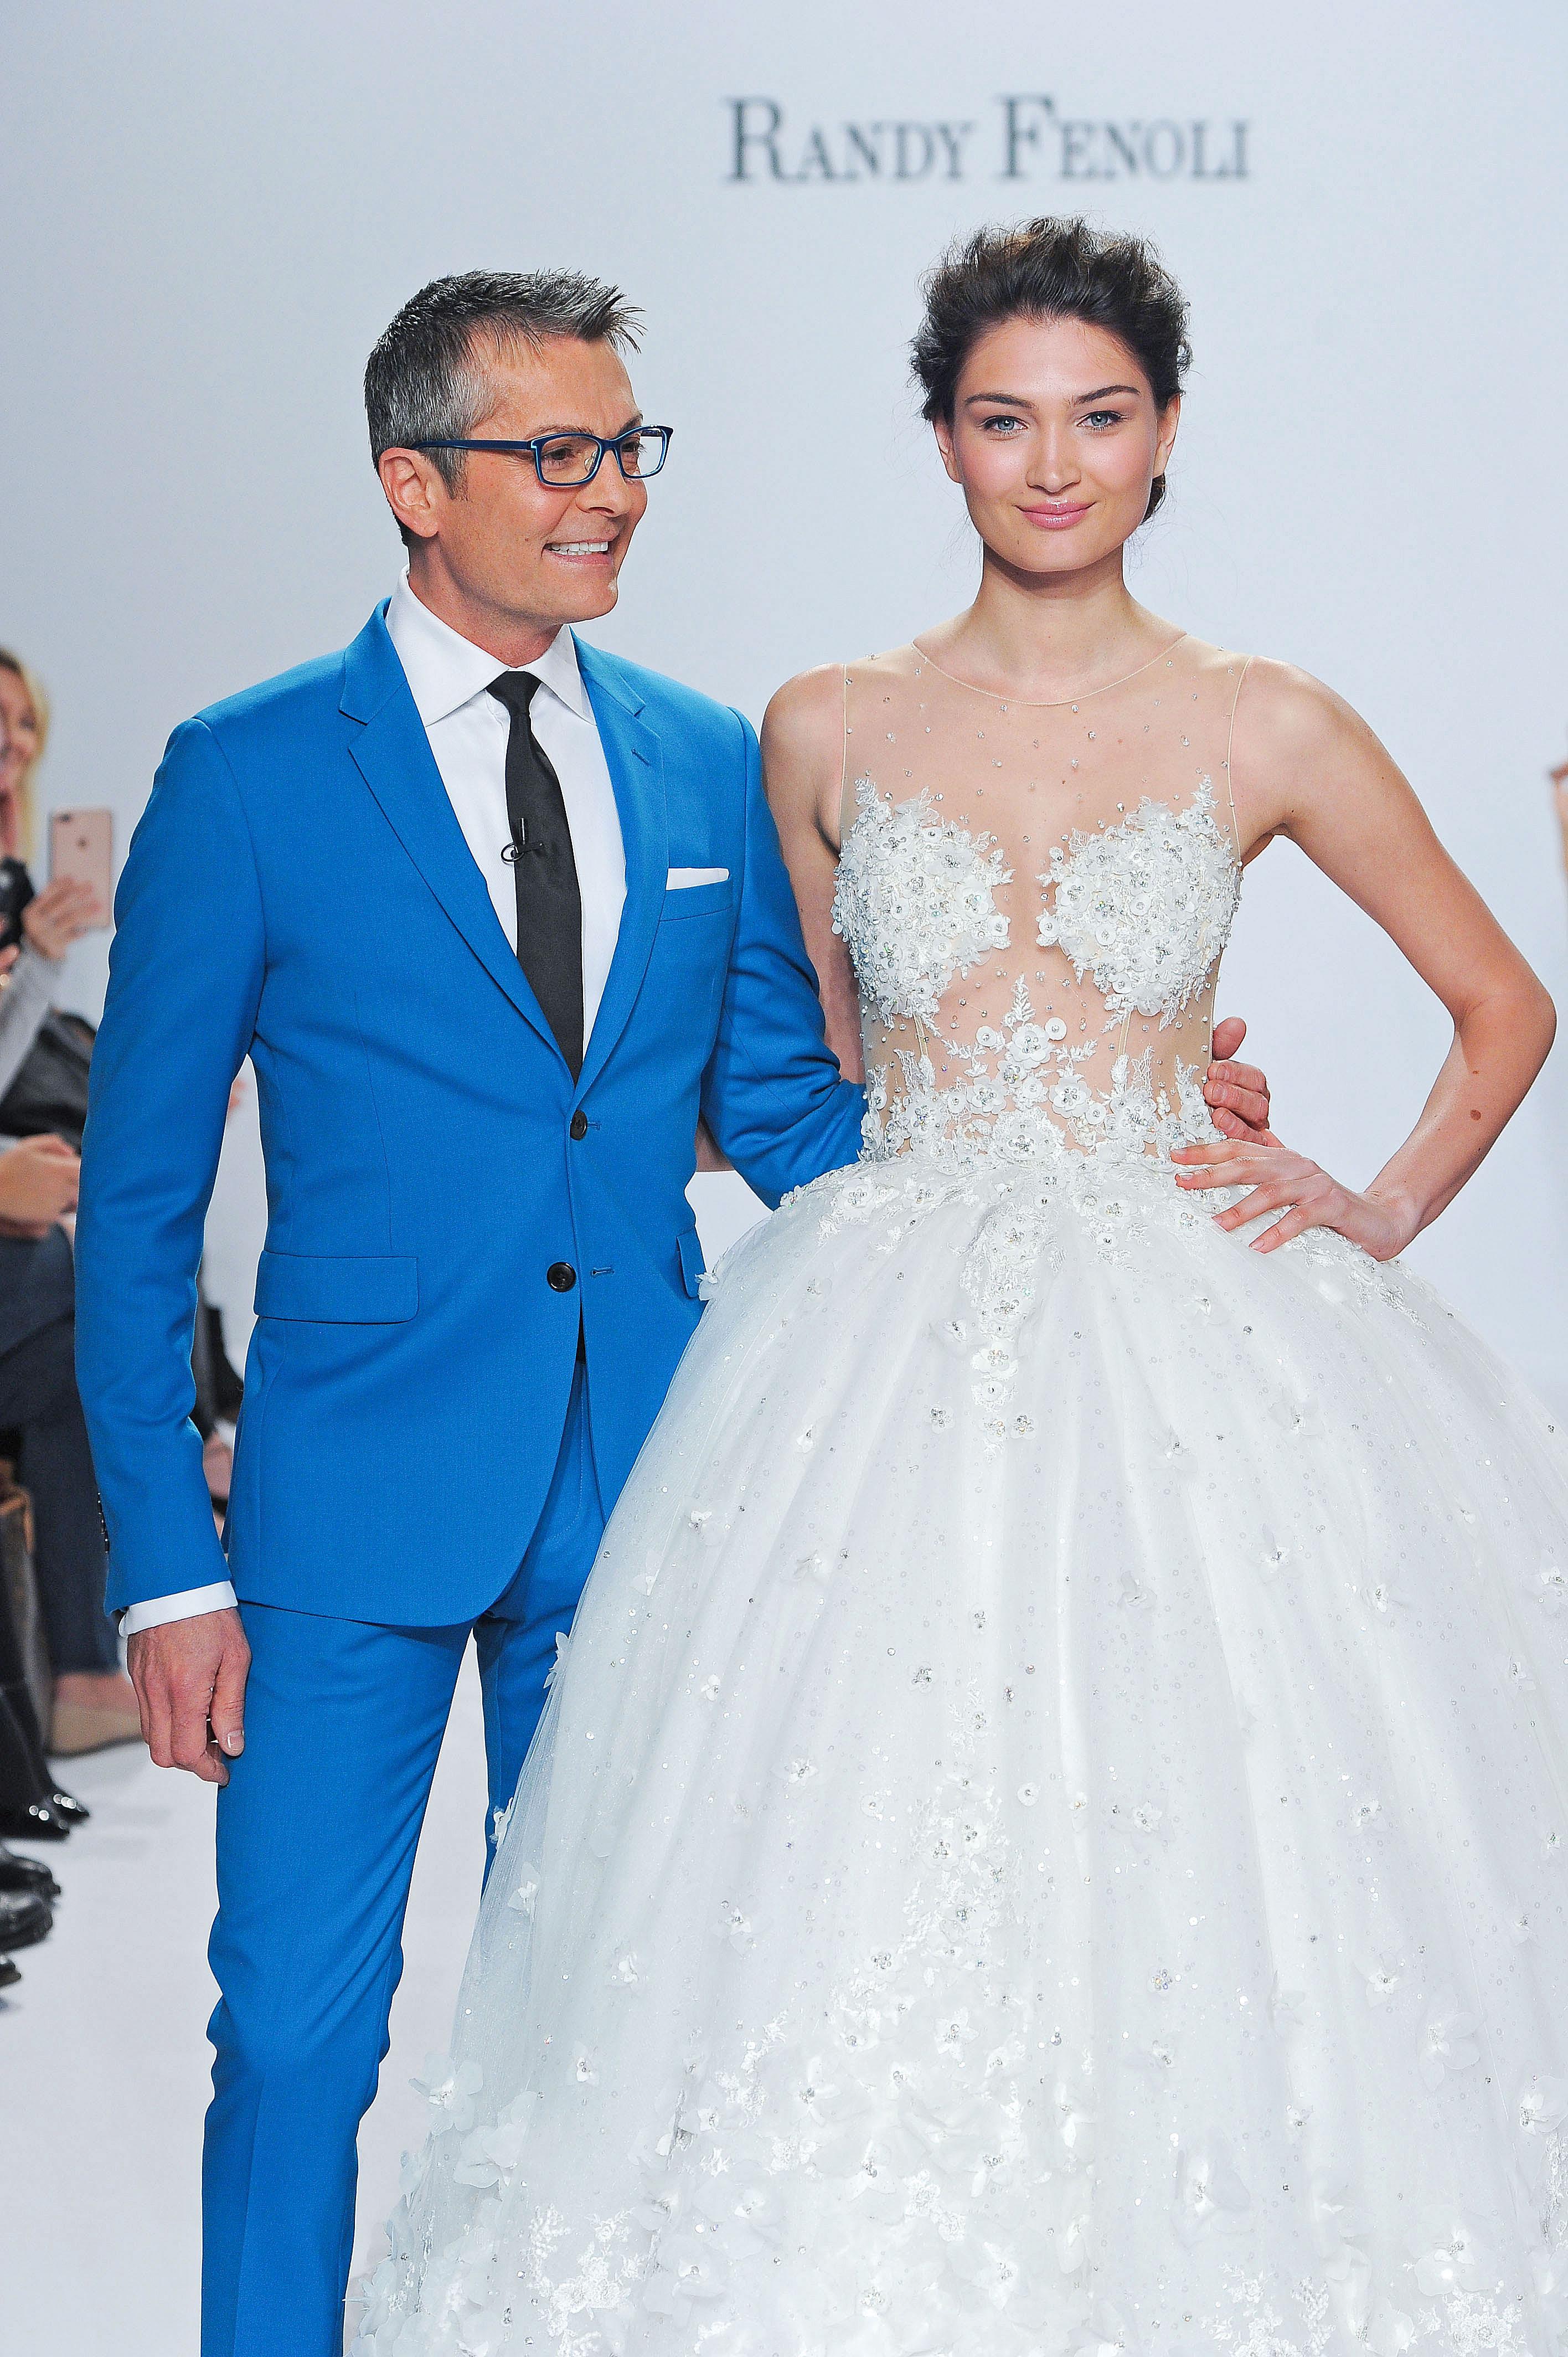 randy fenoli sheer top wedding dress spring 2018